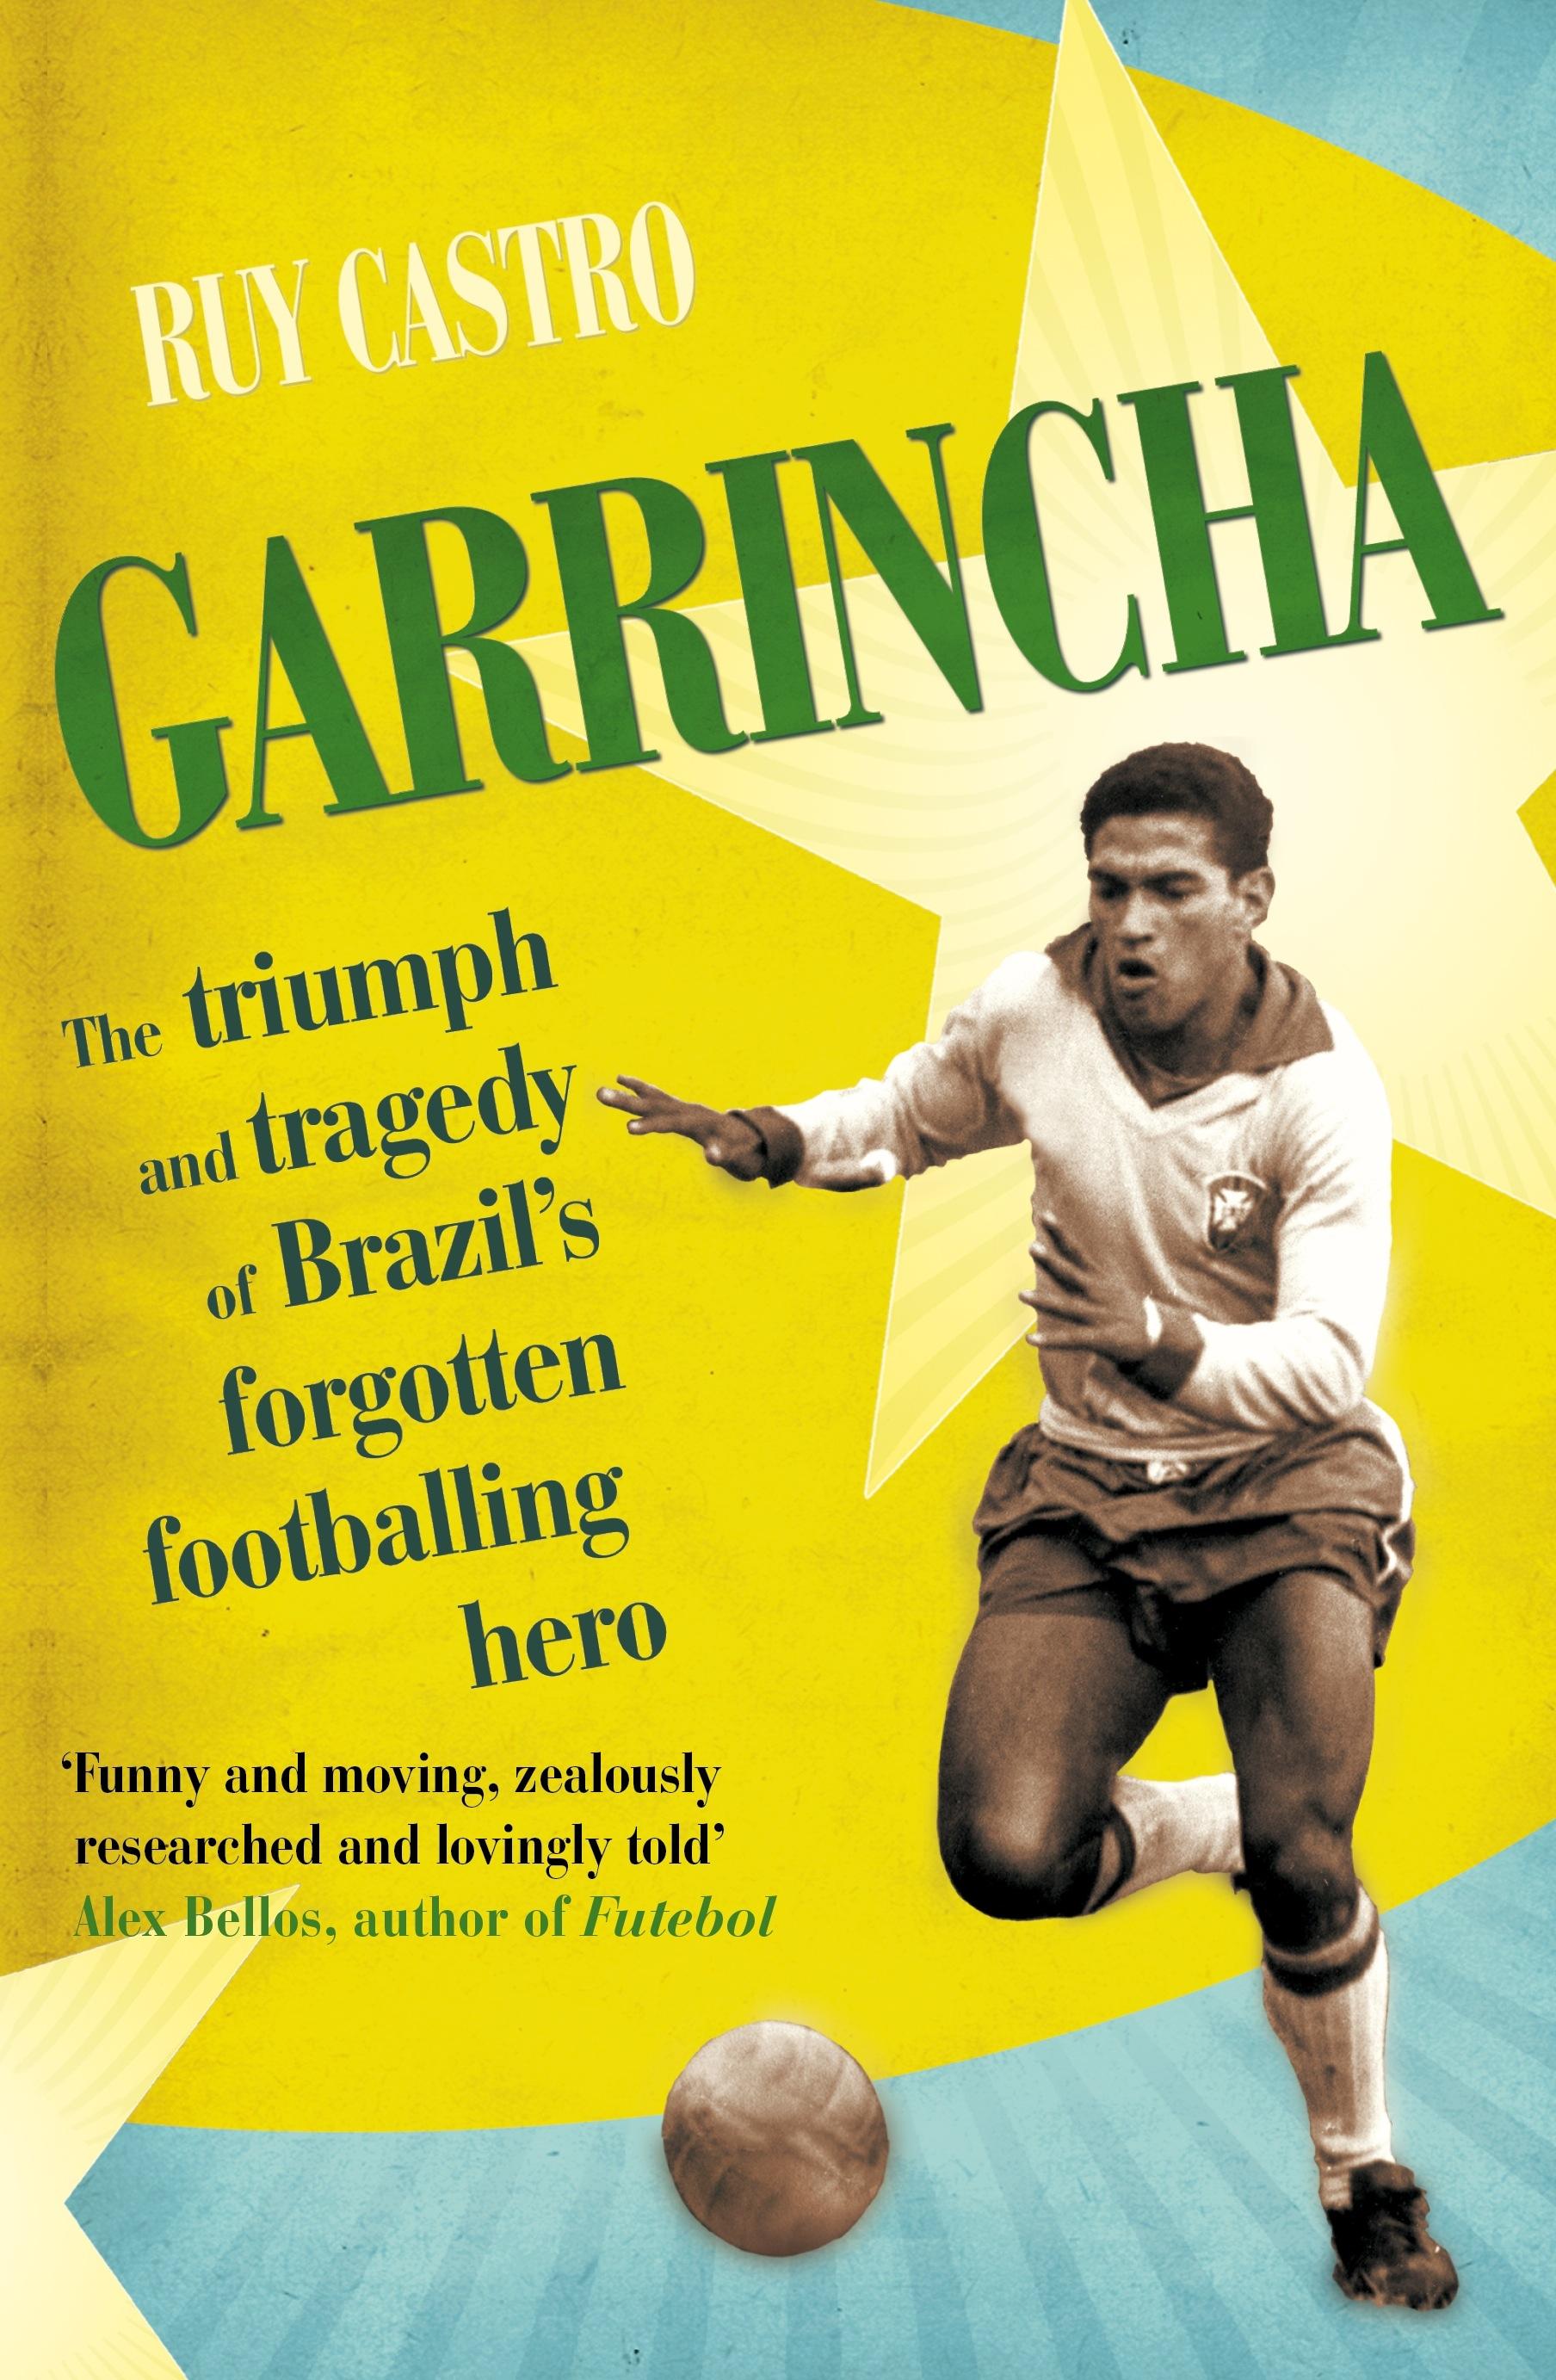 Garrincha by Ruy Castro Penguin Books Australia